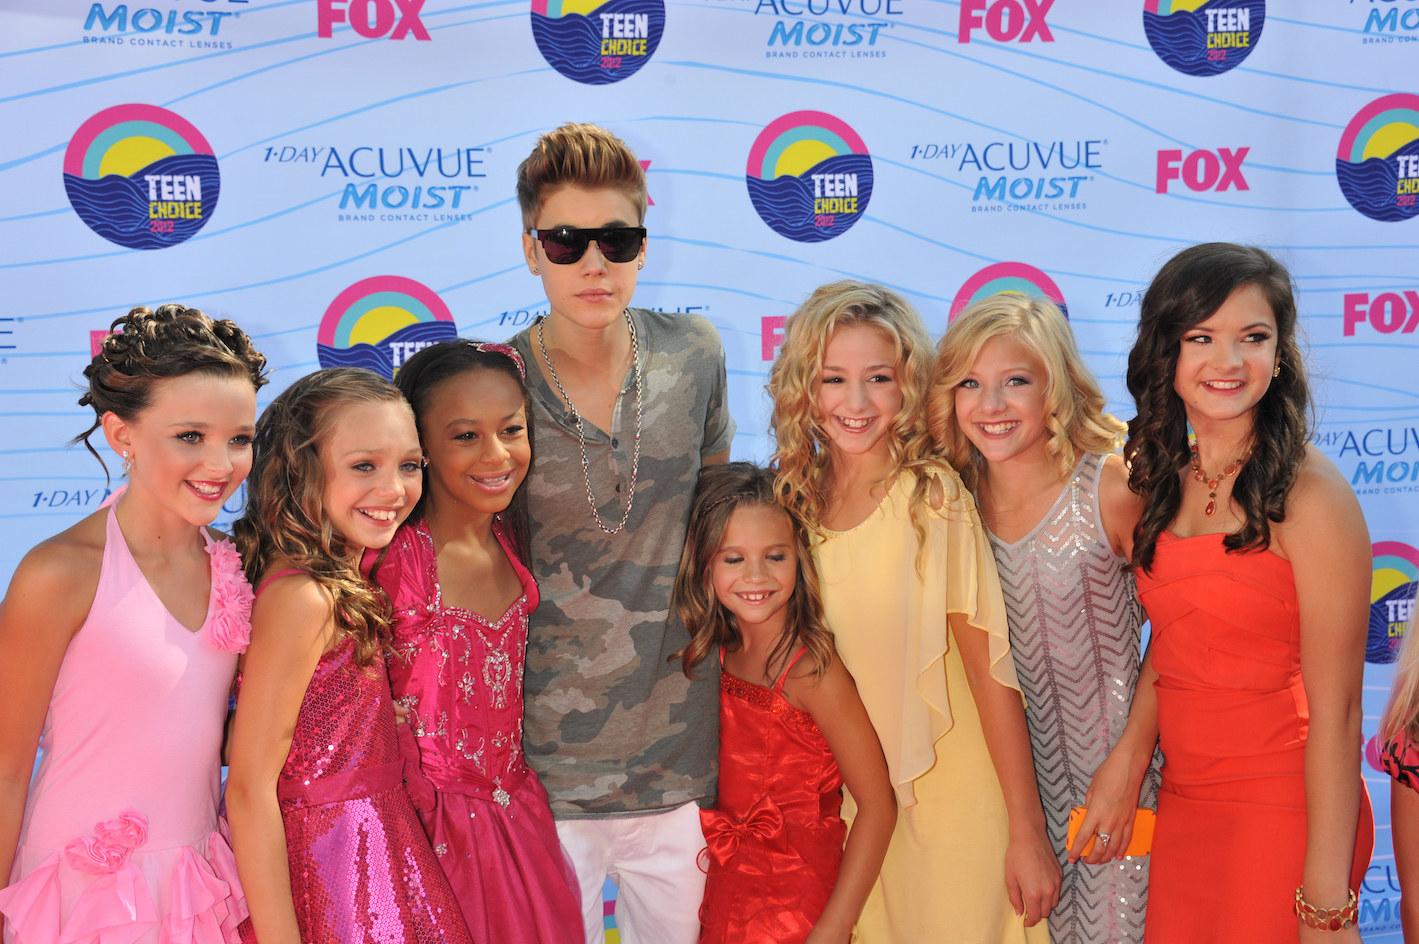 Nia posing with Justin Bieber